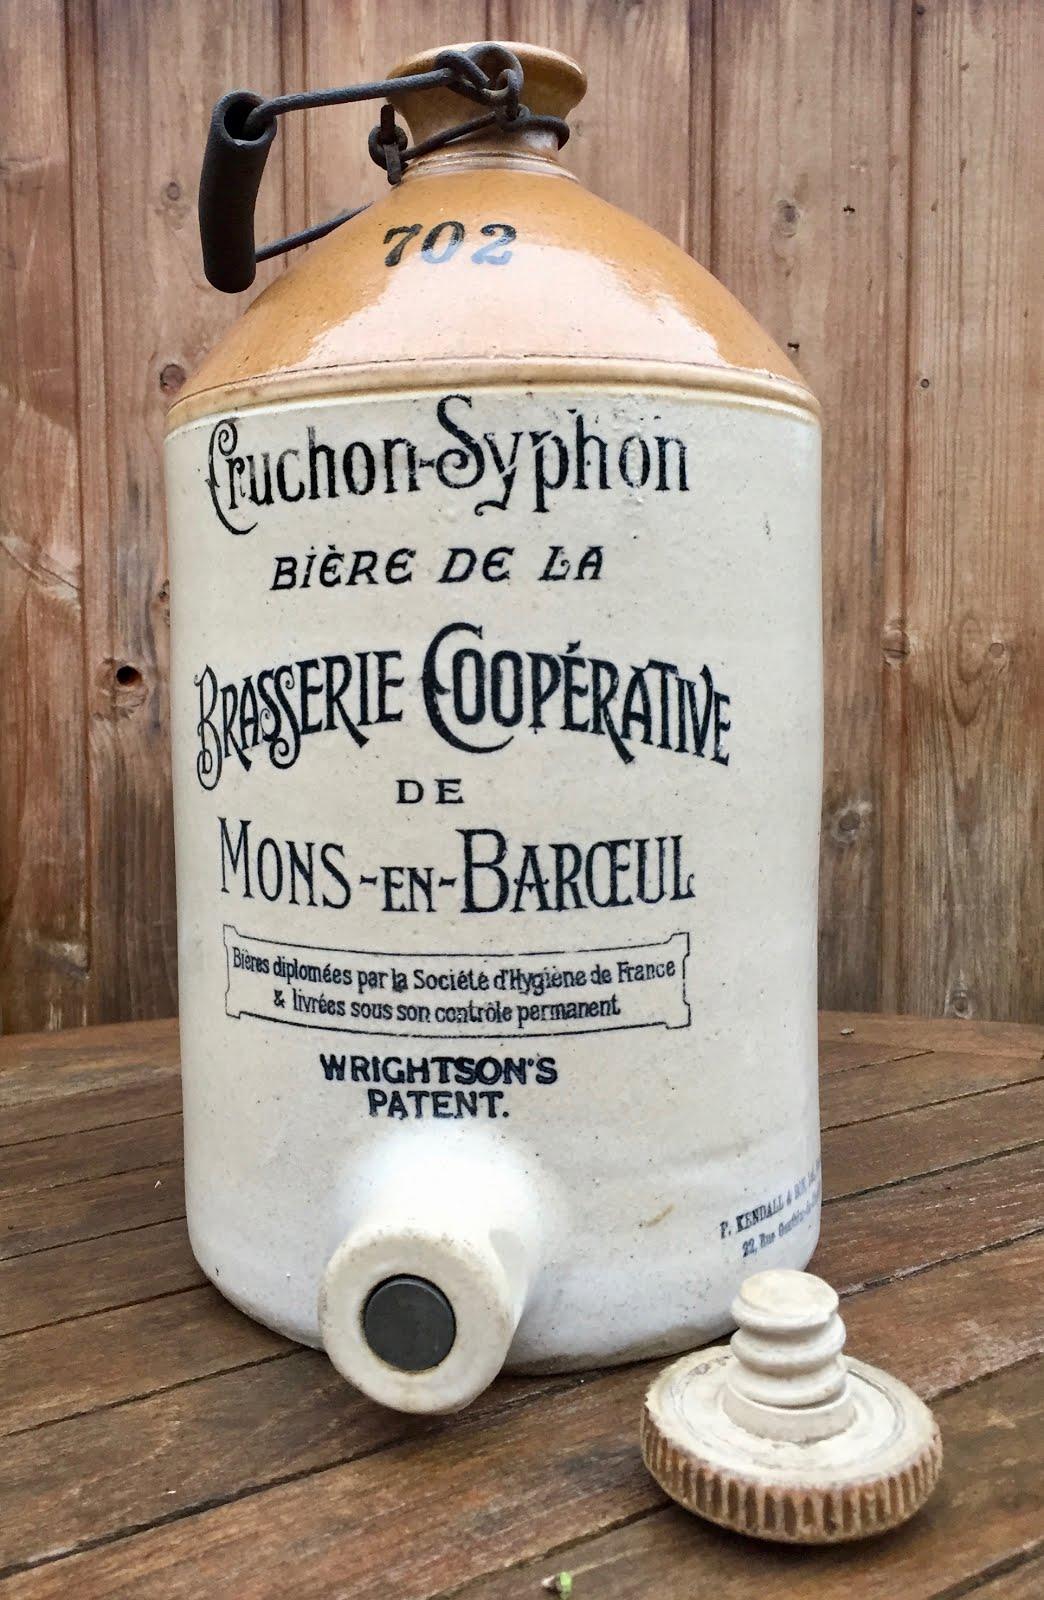 Cruchon-Syphon